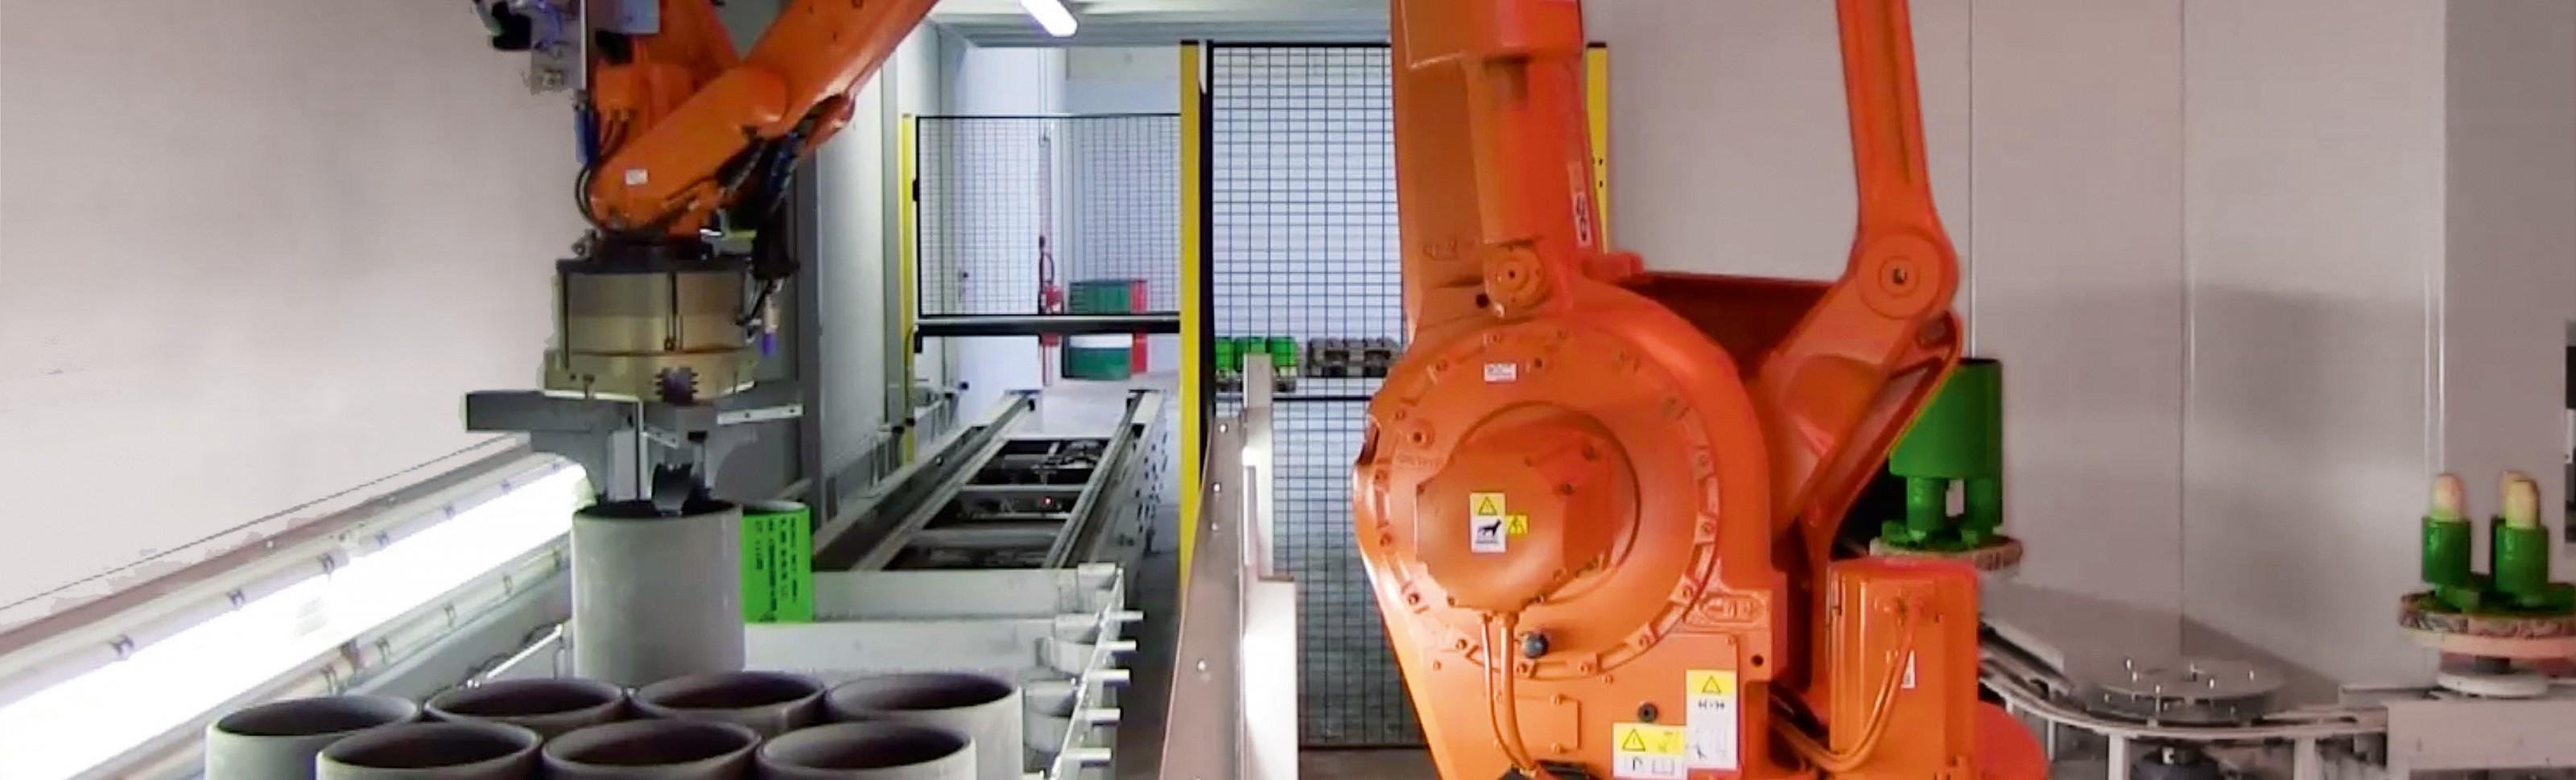 Handling Robots